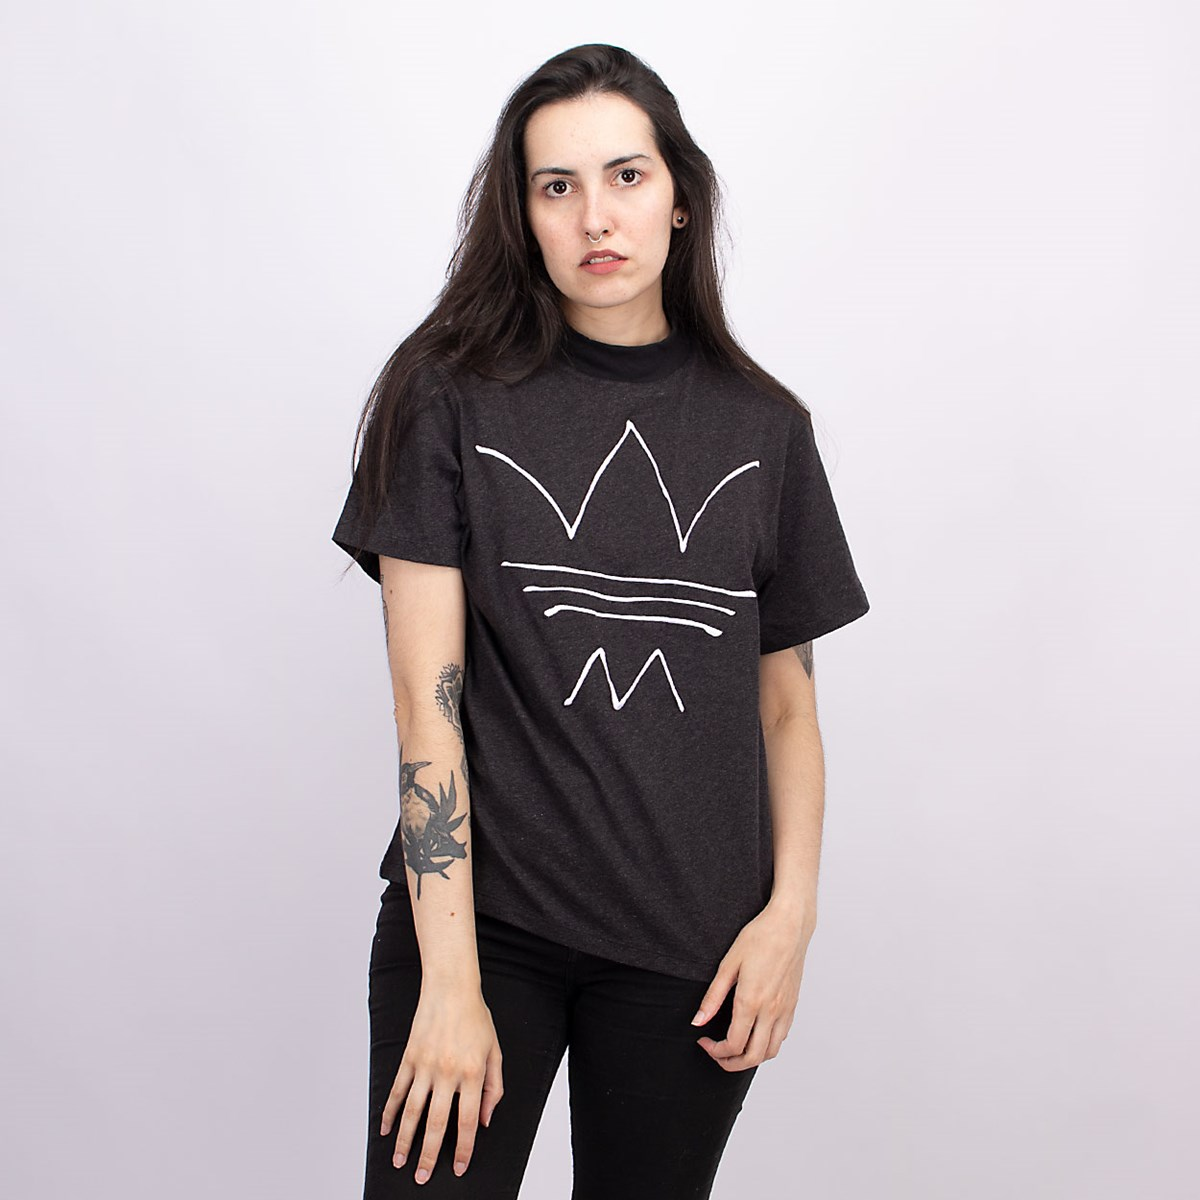 Camiseta adidas R.Y.V. Black Melange GN4338